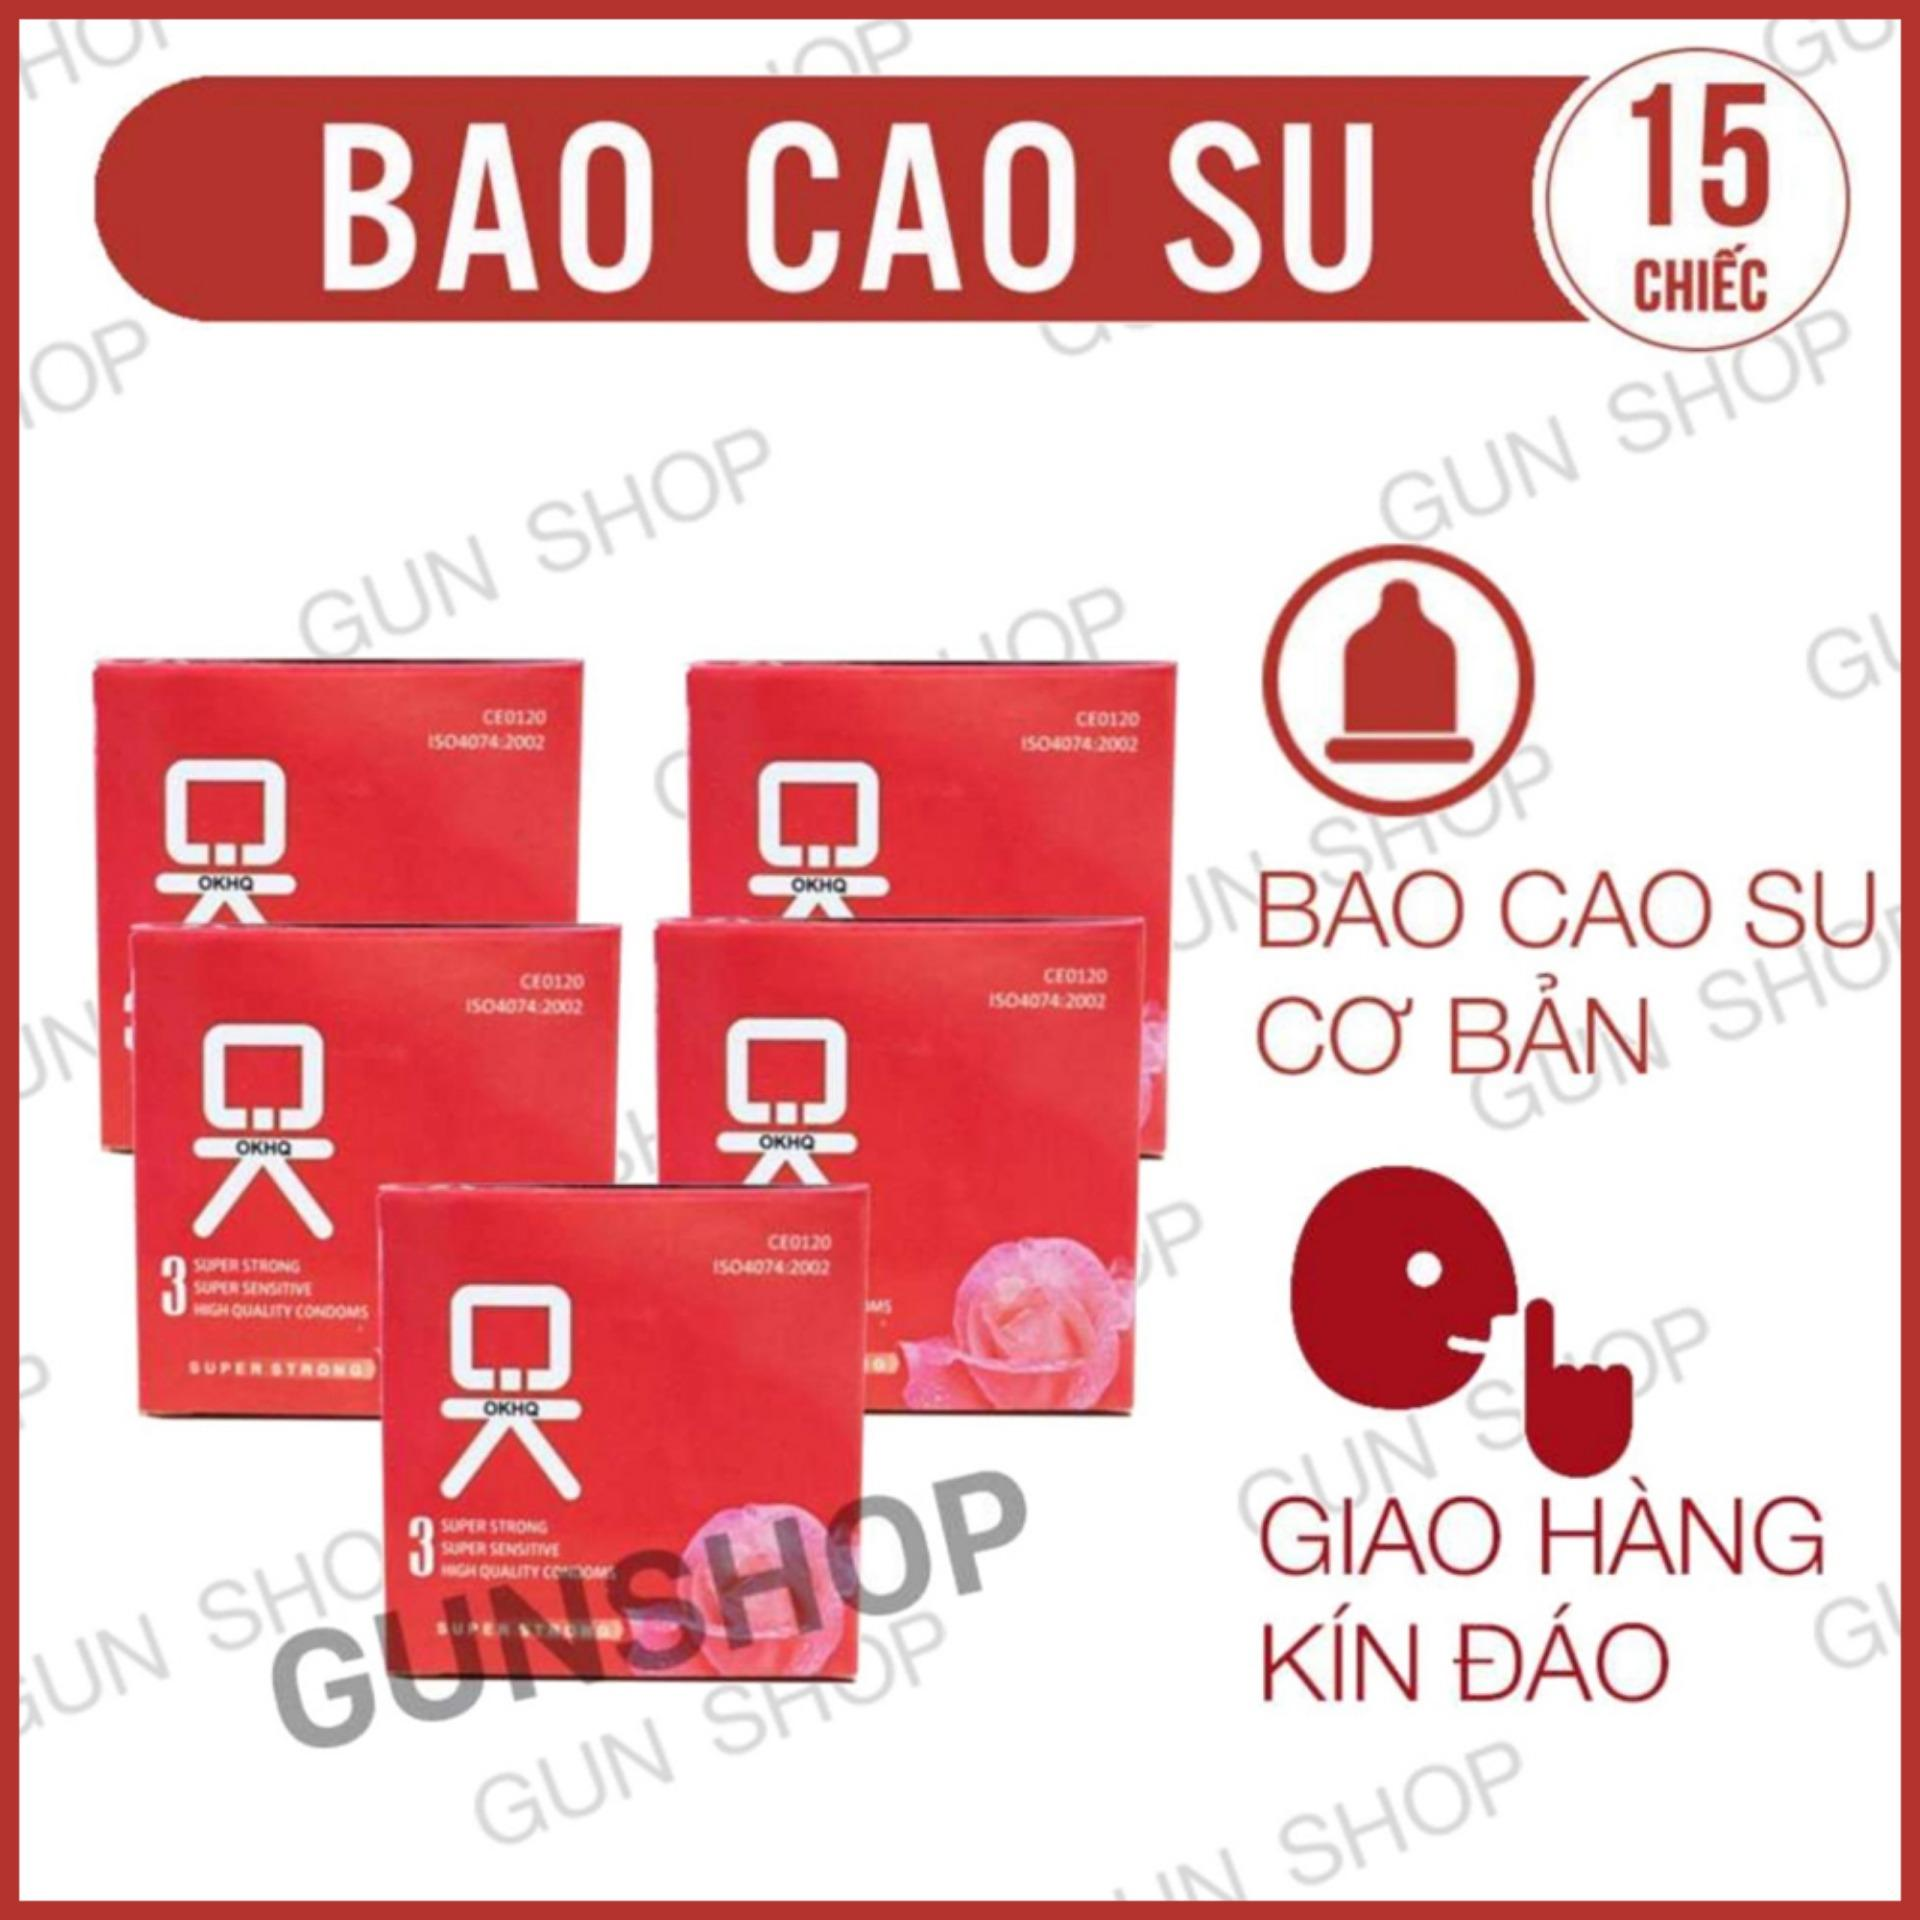 Bộ 5 Hộp Bao Cao Su OK Không Mùi (Hộp 3 chiếc) - [ Gunshop-BCS05 ]